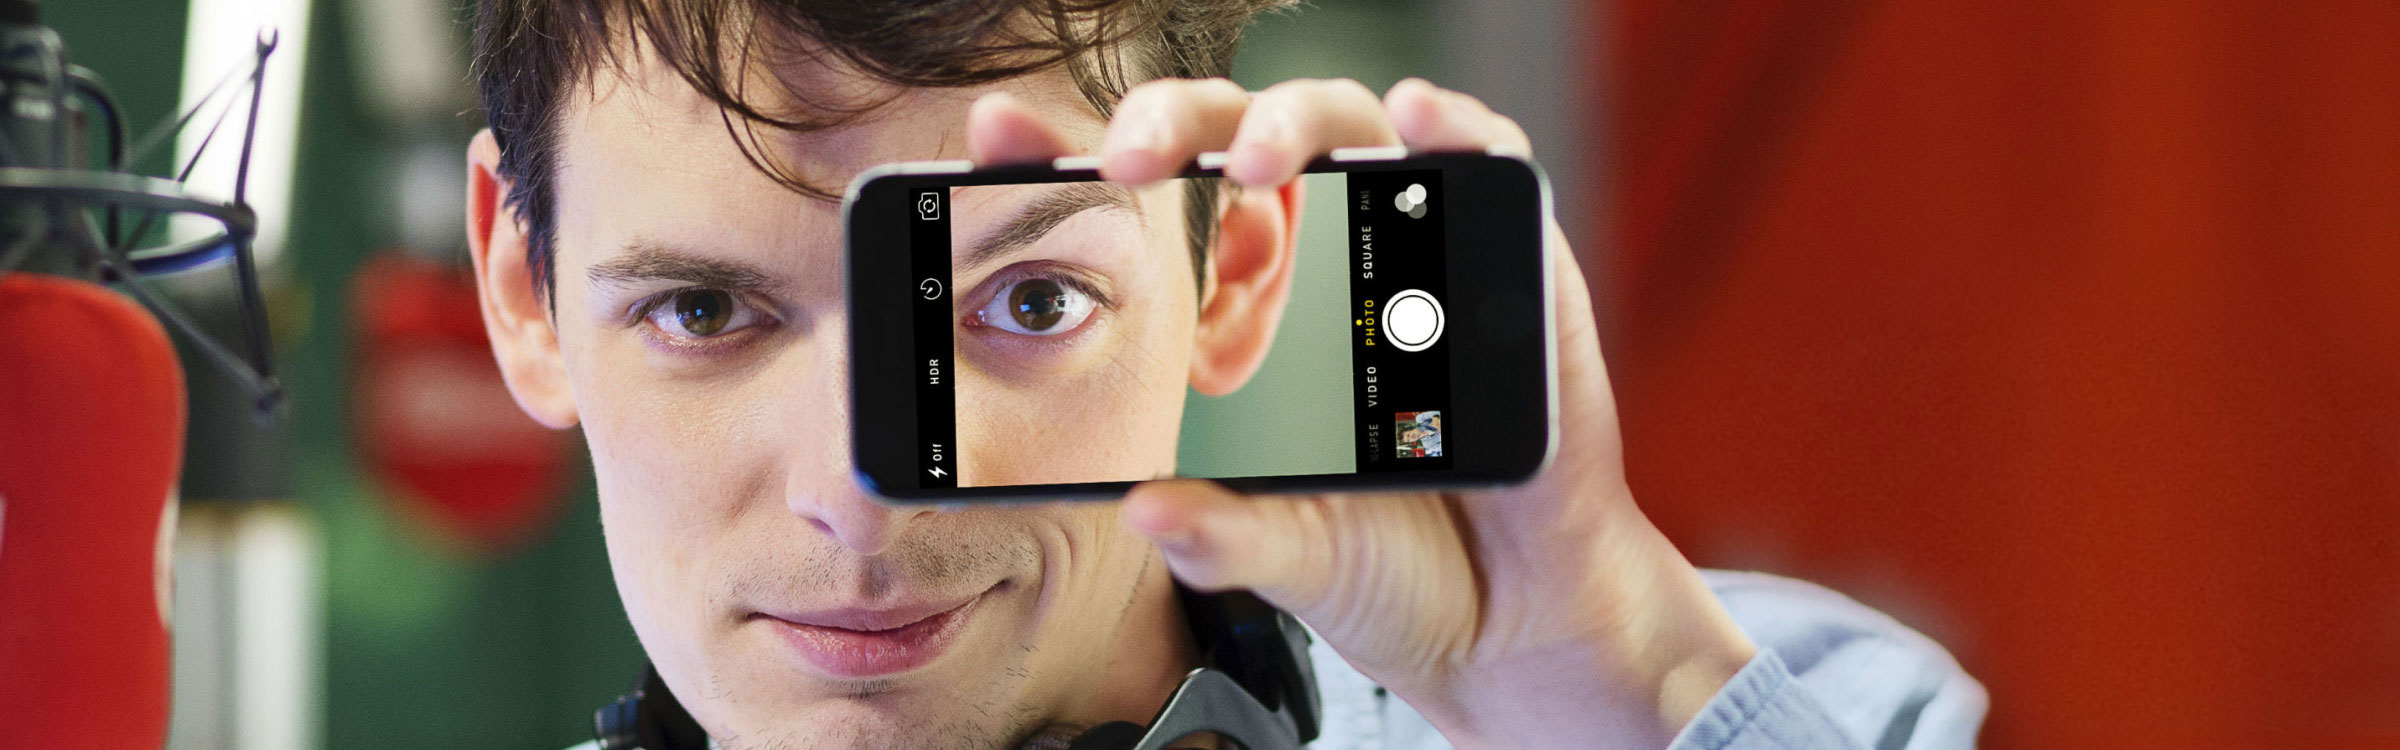 Rik smartphone 2400x750 pagina